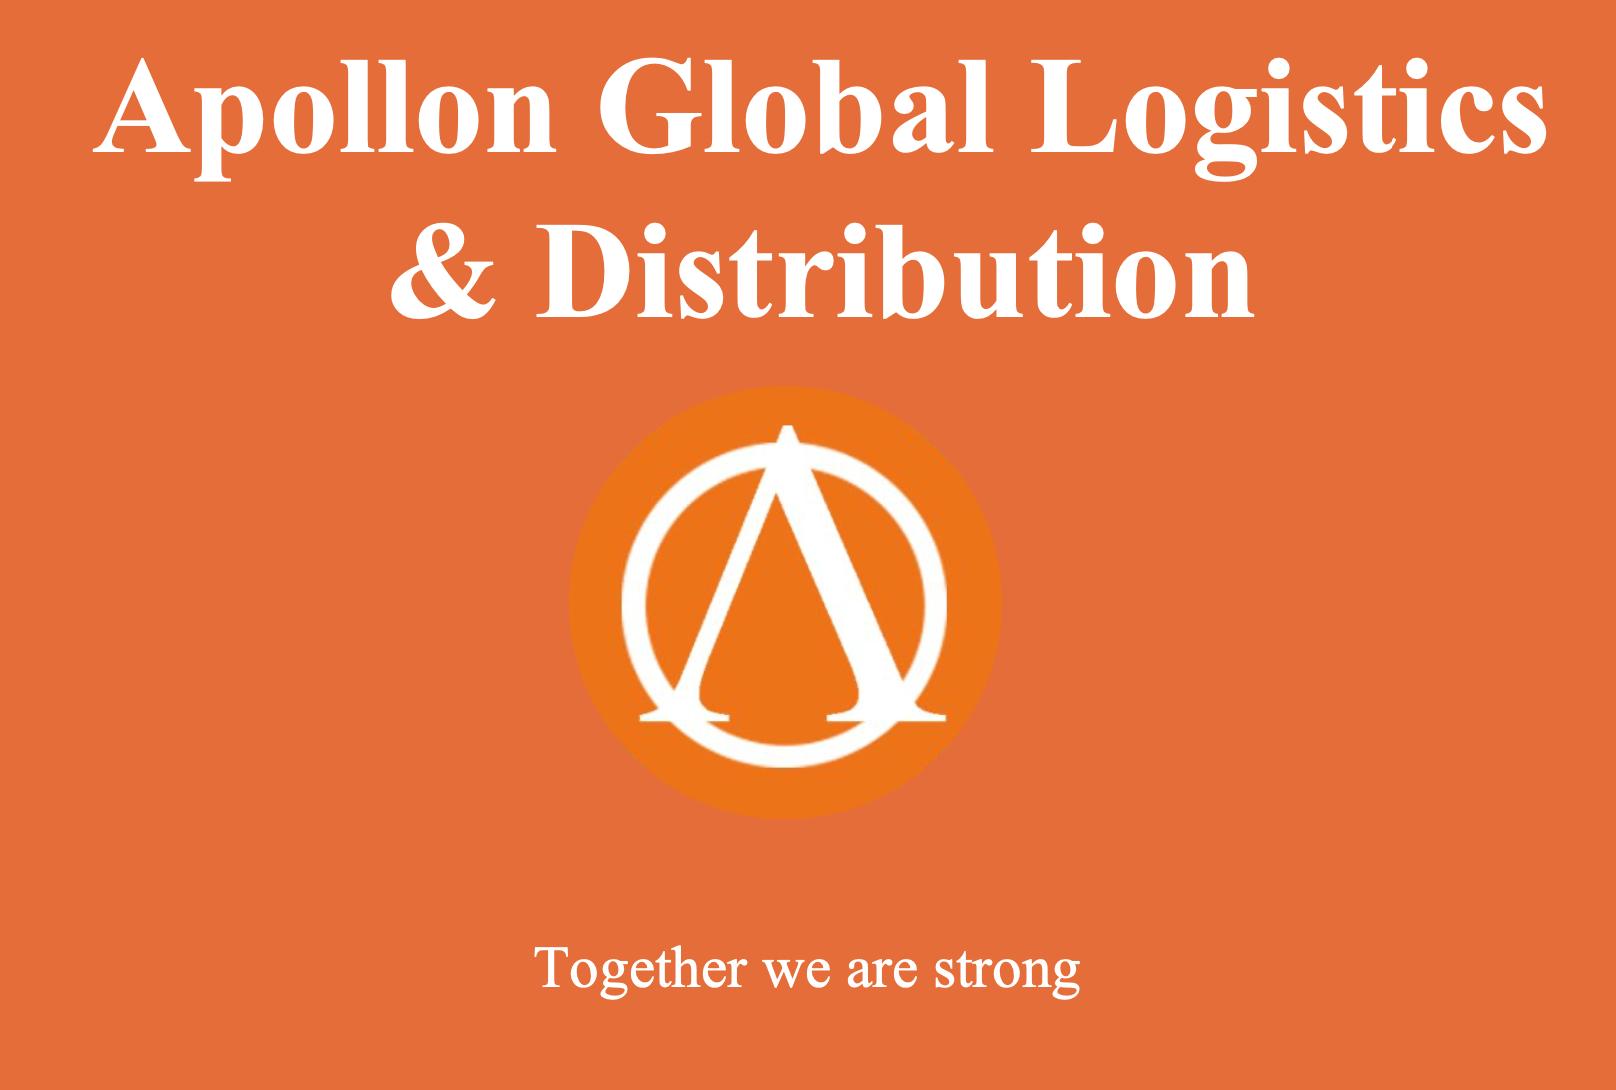 Apollon Global Logistics & Distribution